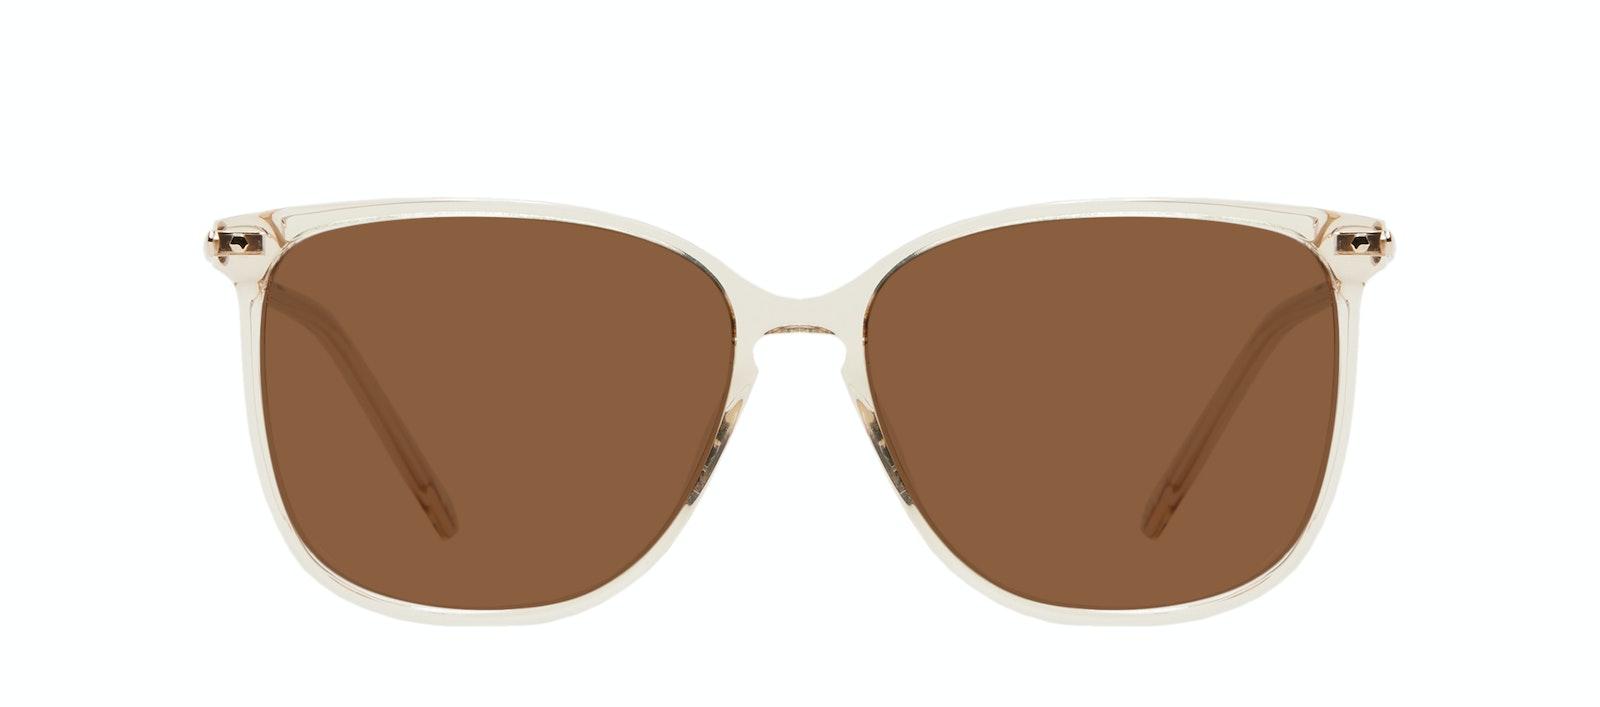 Affordable Fashion Glasses Square Sunglasses Women Sonia XS Blush Front